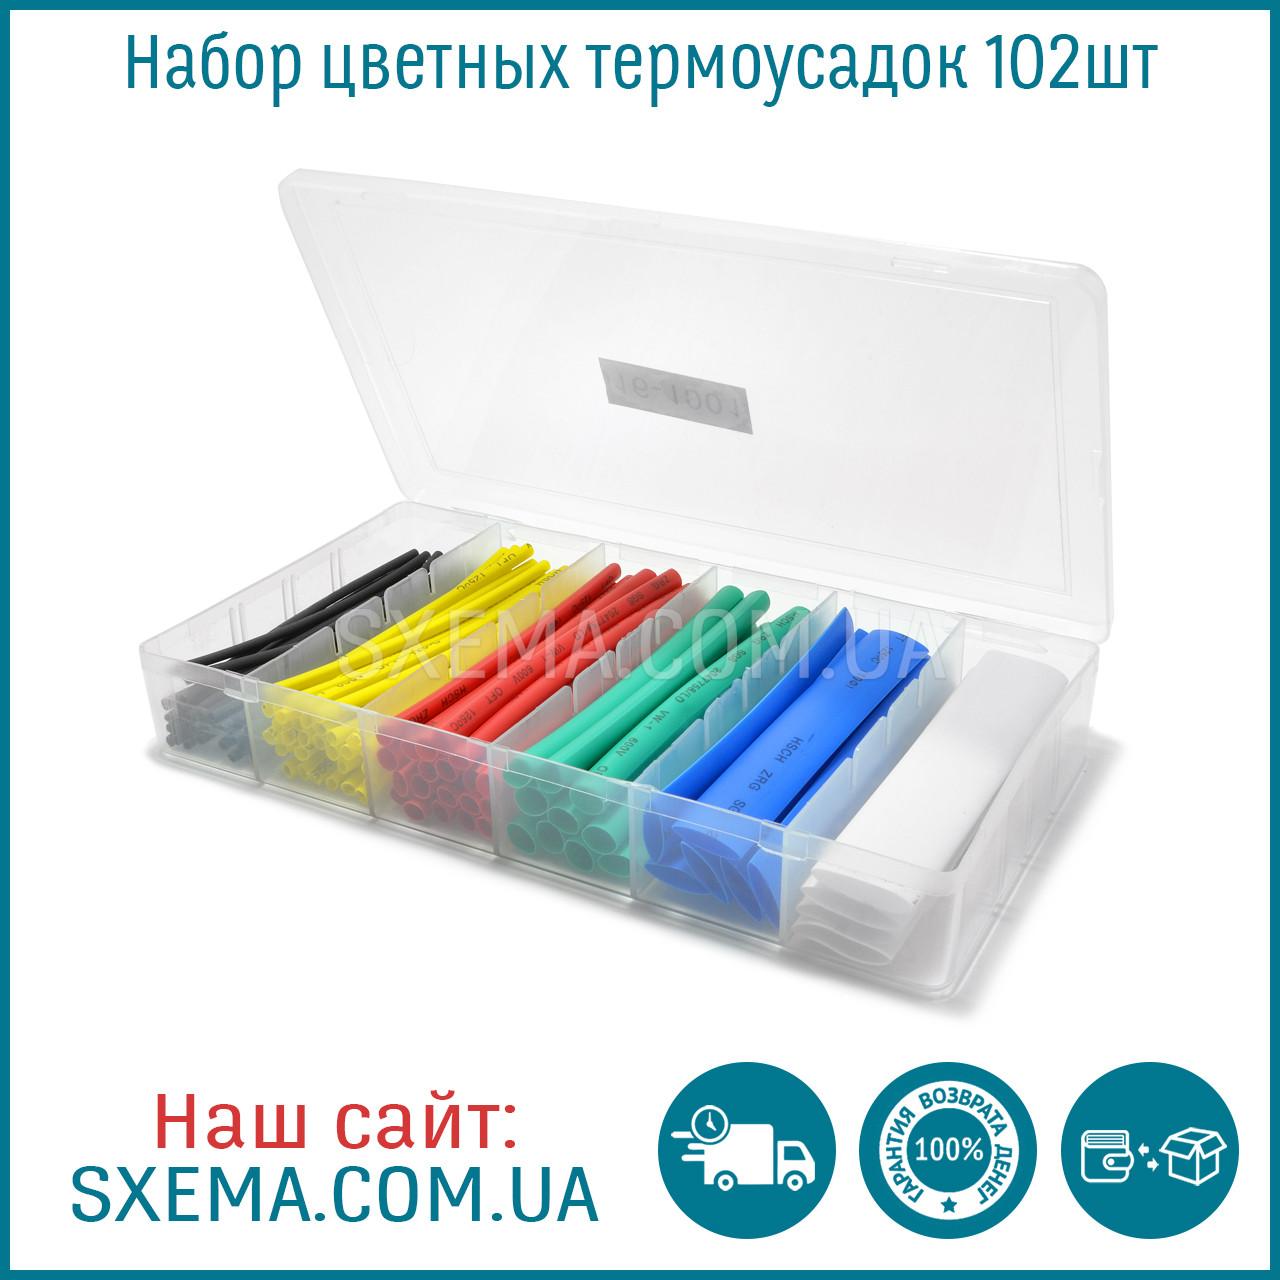 Набор цветных термоусадочных трубок 102шт (1.5; 2.5; 4.0; 6.0; 10; 13мм) термоусадка